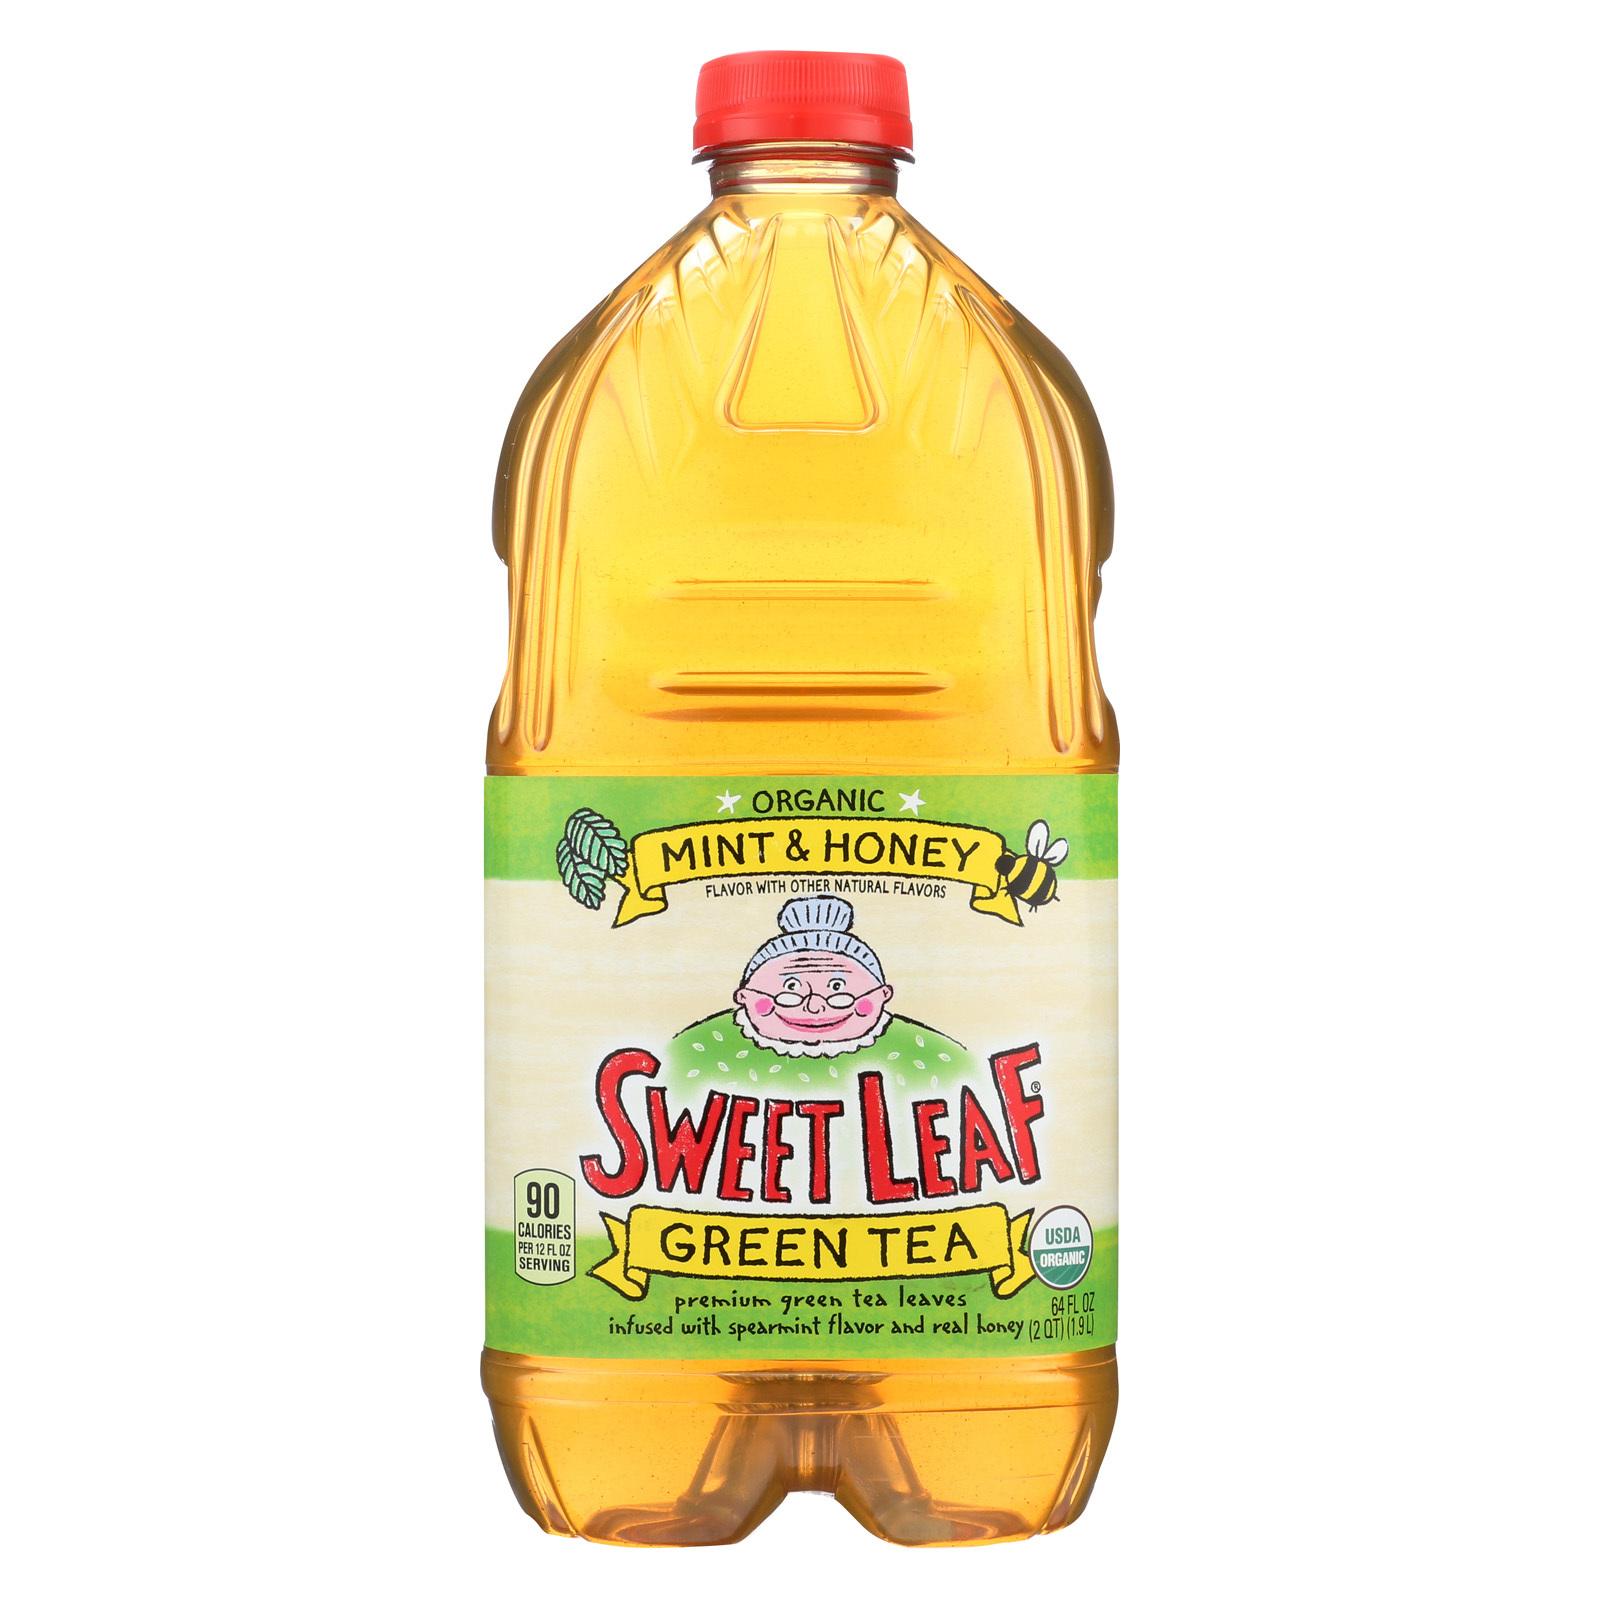 Sweet Leaf Tea Iced Green Tea - Mint and Honey - Case of 8 - 64 Fl oz.